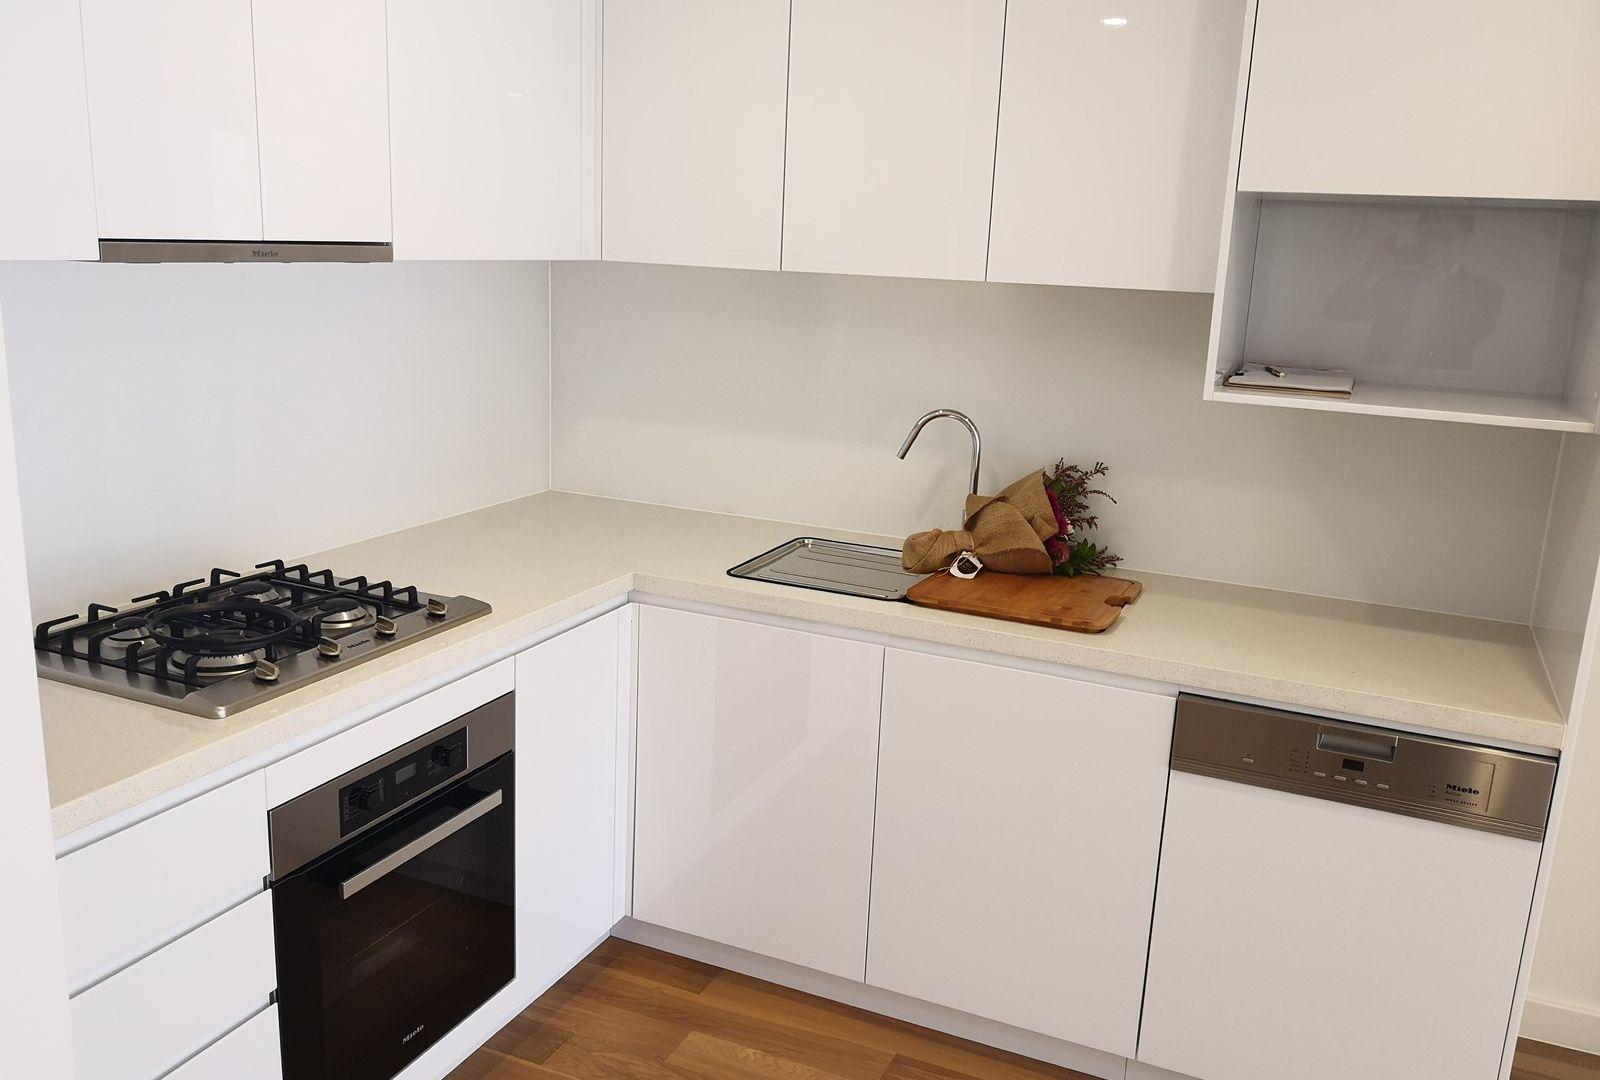 207/1-5 Smith St, Ryde NSW 2112, Image 1